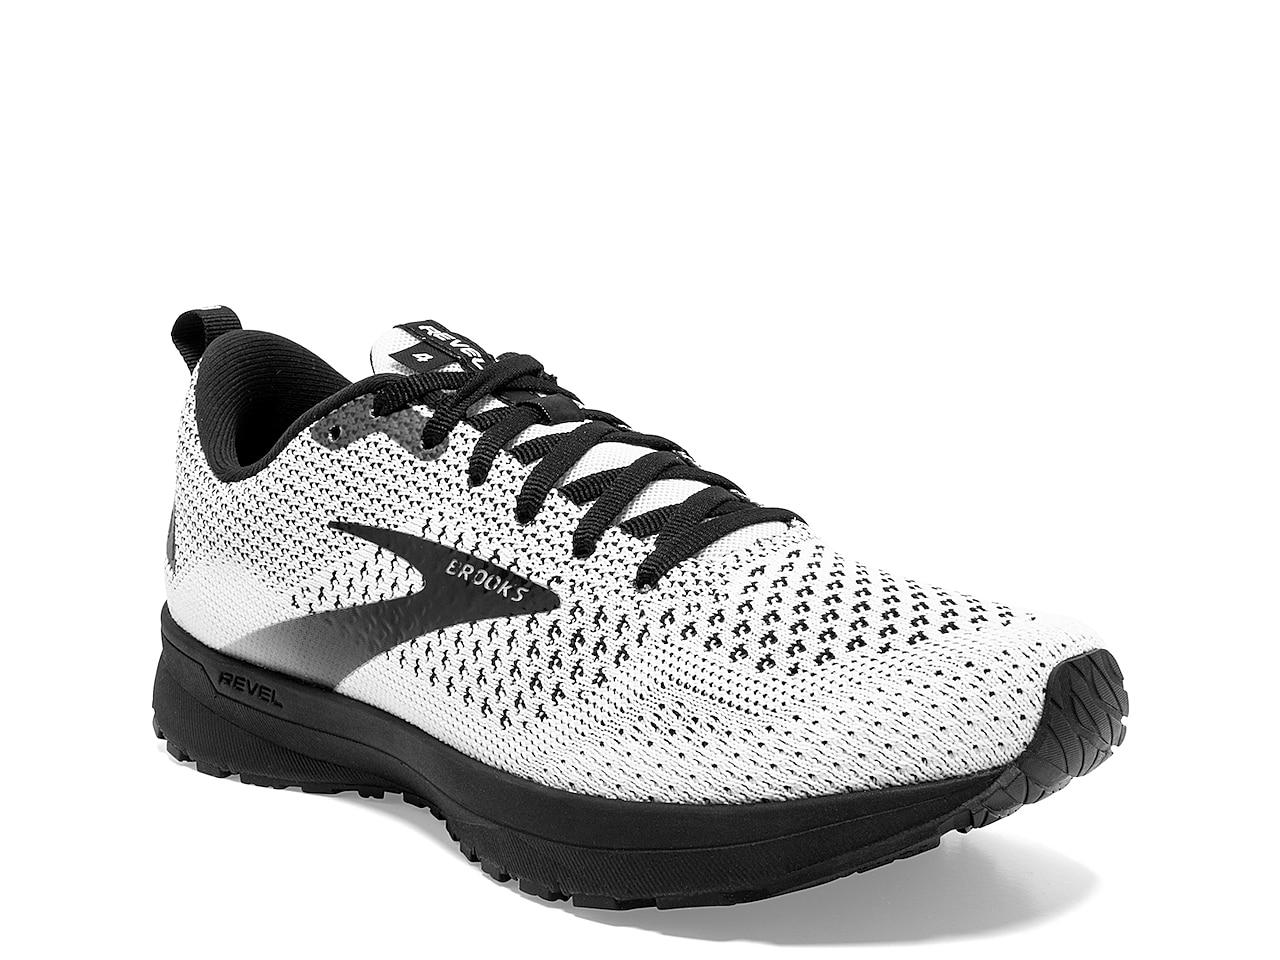 Brooks Revel 4 Running Shoe - Women's